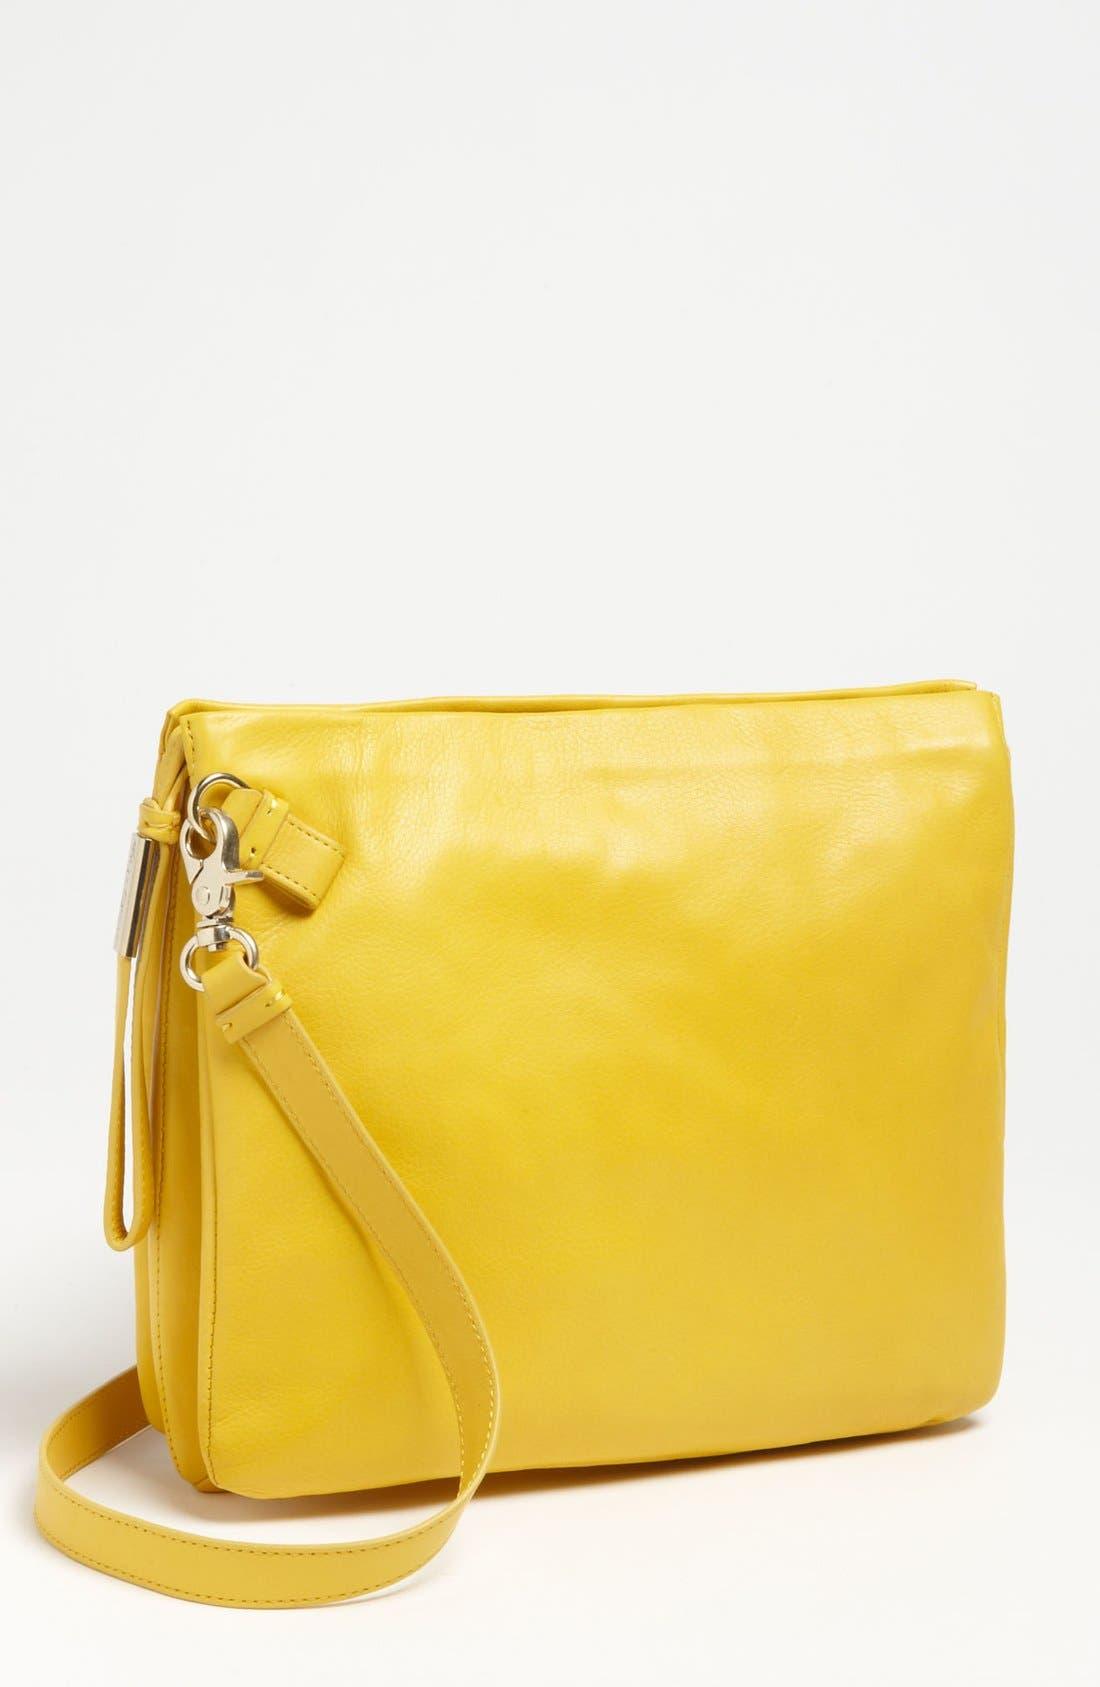 Main Image - Foley + Corinna 'iPad Cache' Leather Crossbody Bag